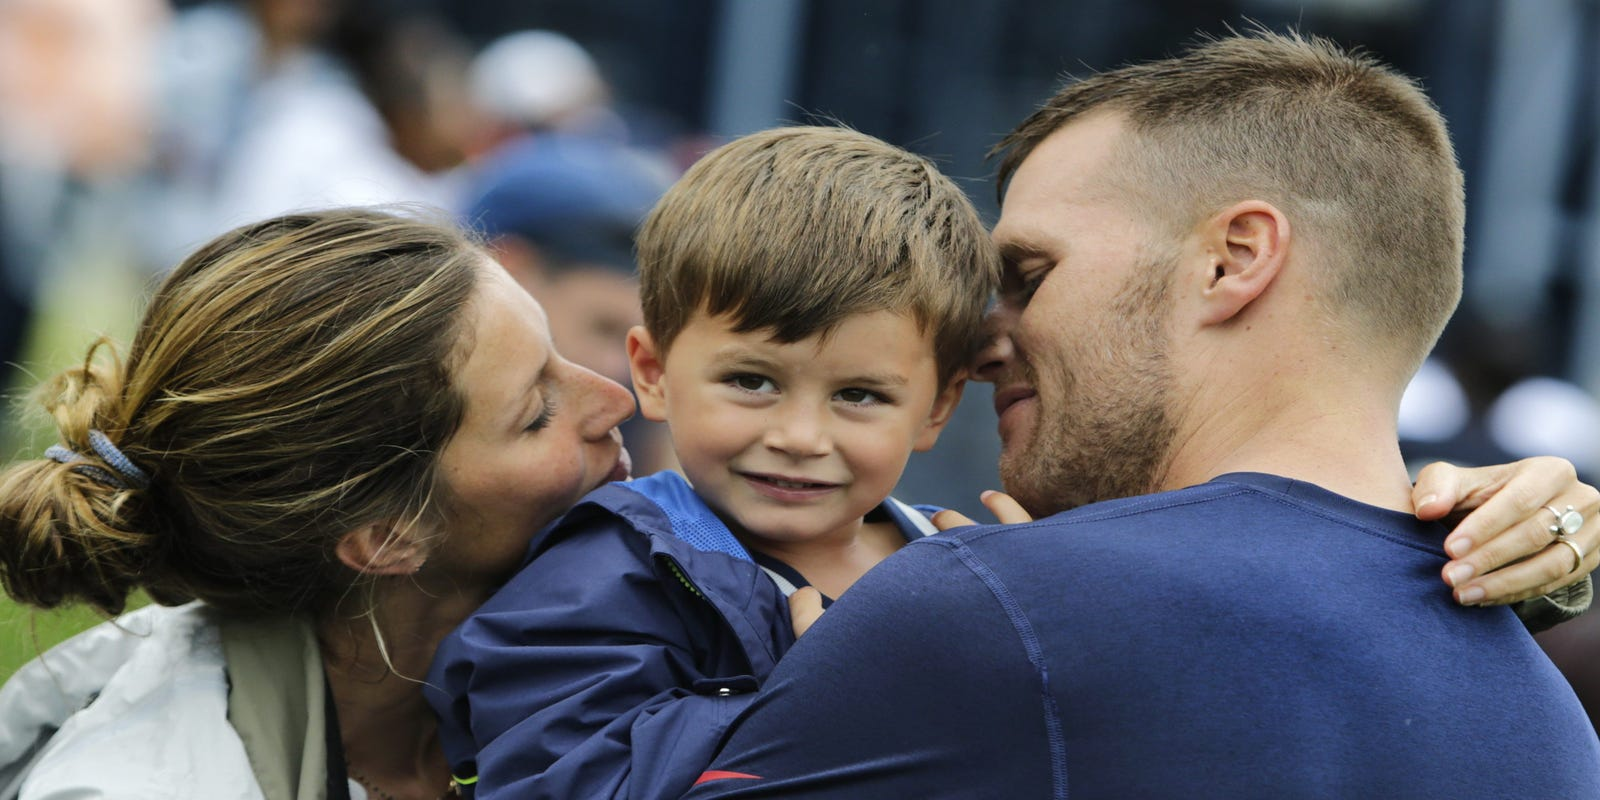 Tom Brady S Wife Gisele Helped Him Accept Son S Disinterest In Sports